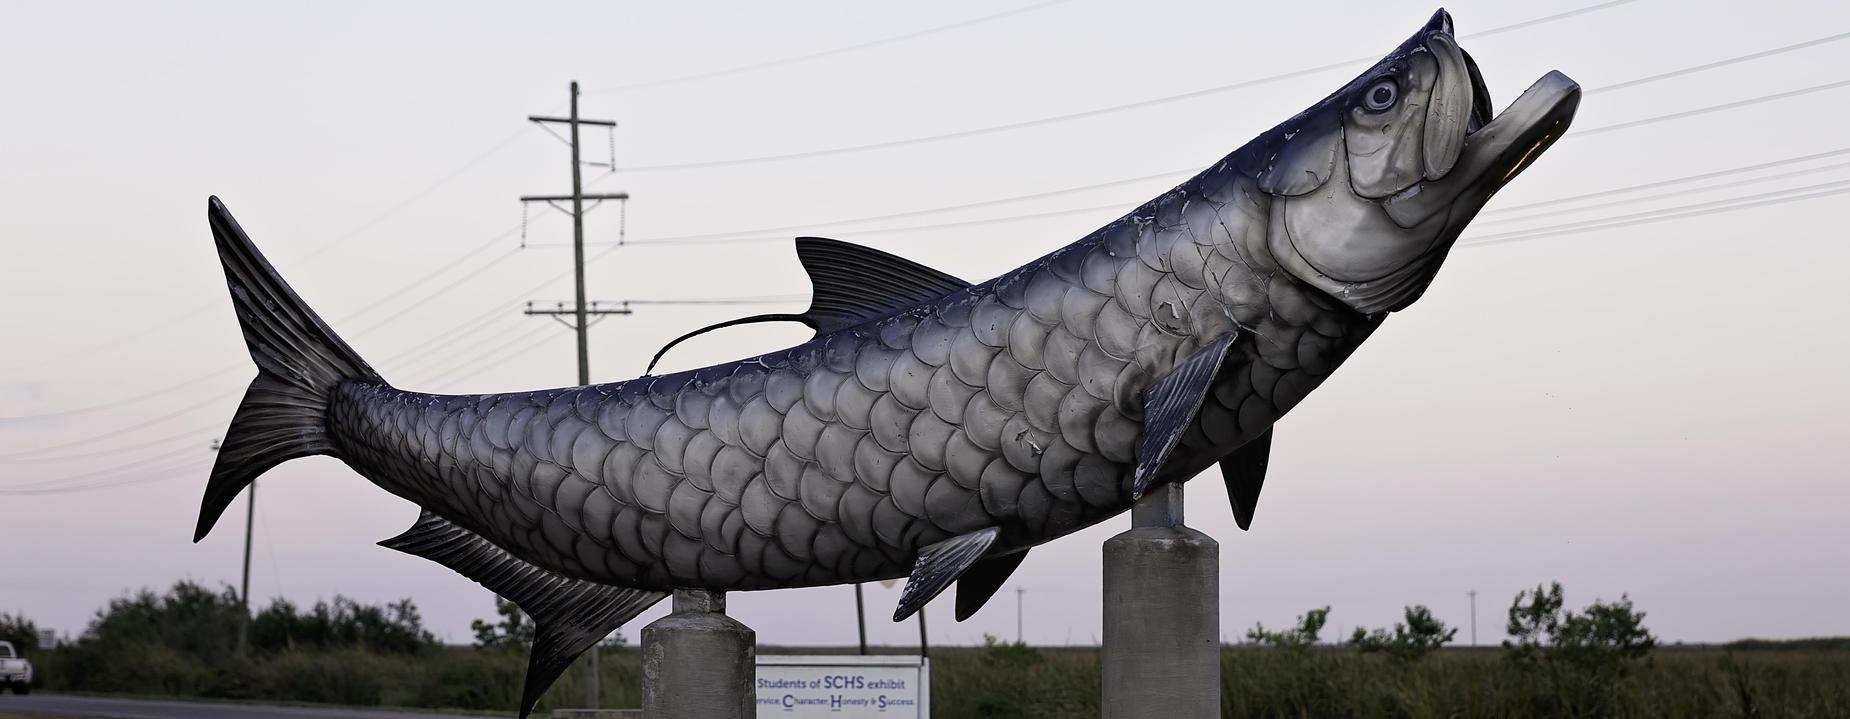 Tarpon Statue